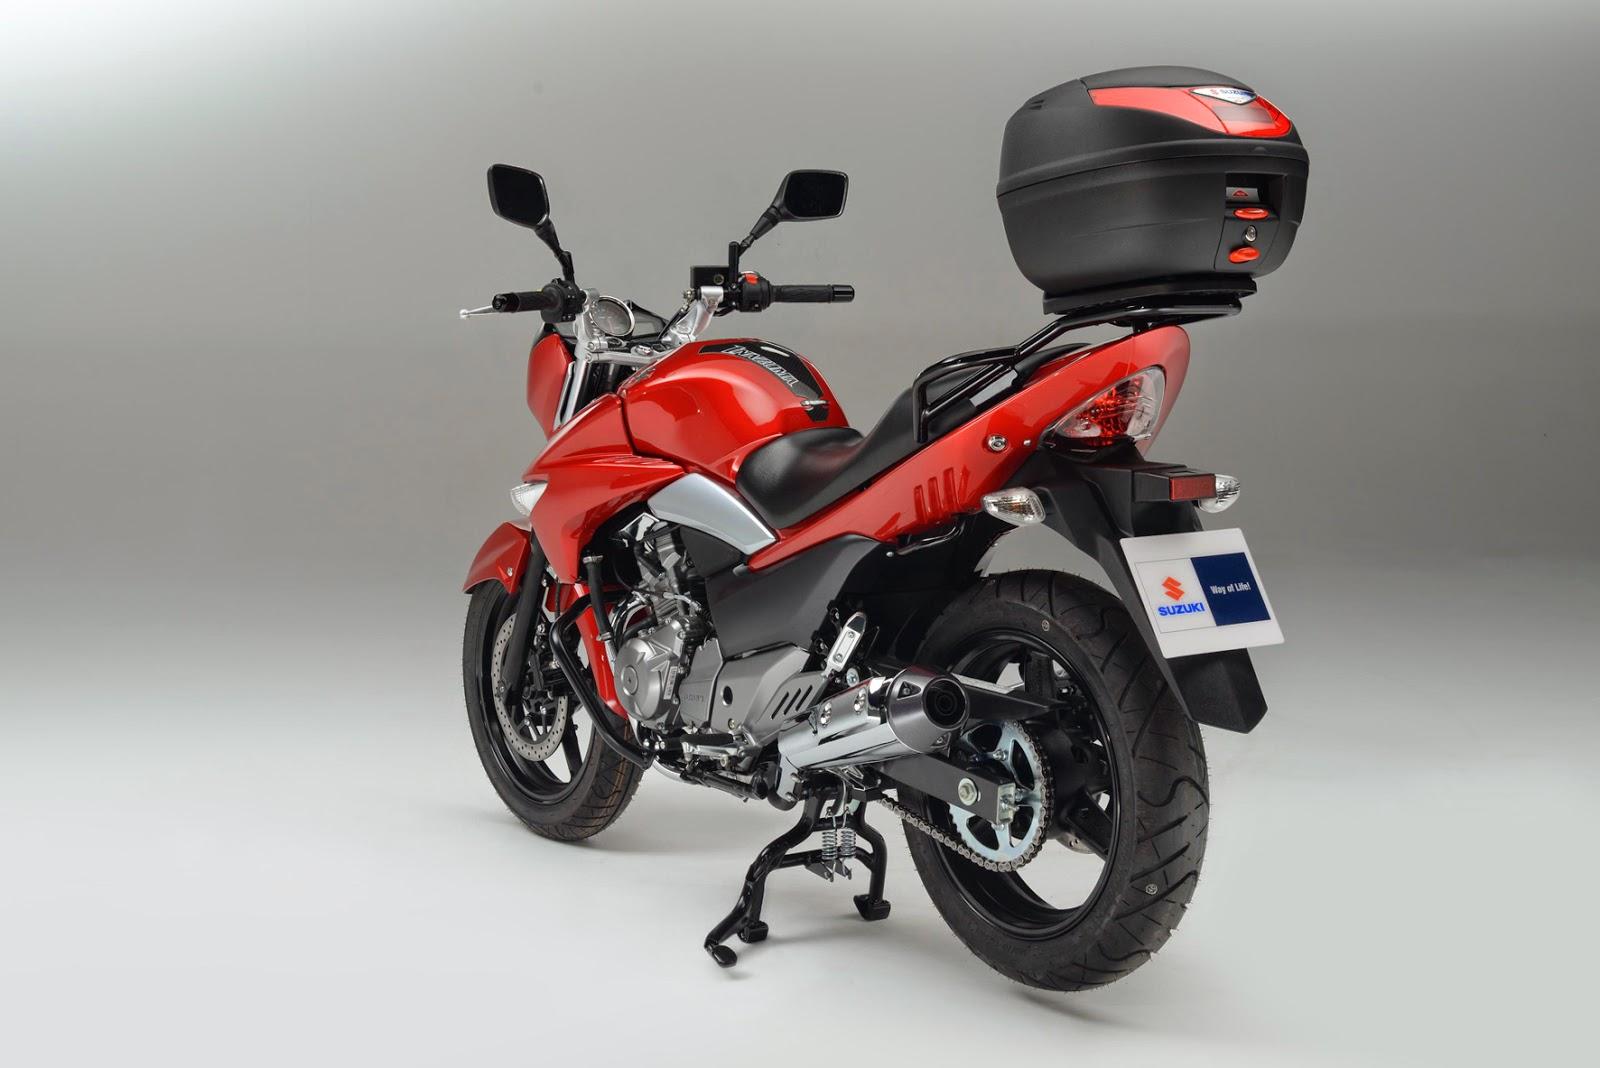 Suzuki Inazuma 2013